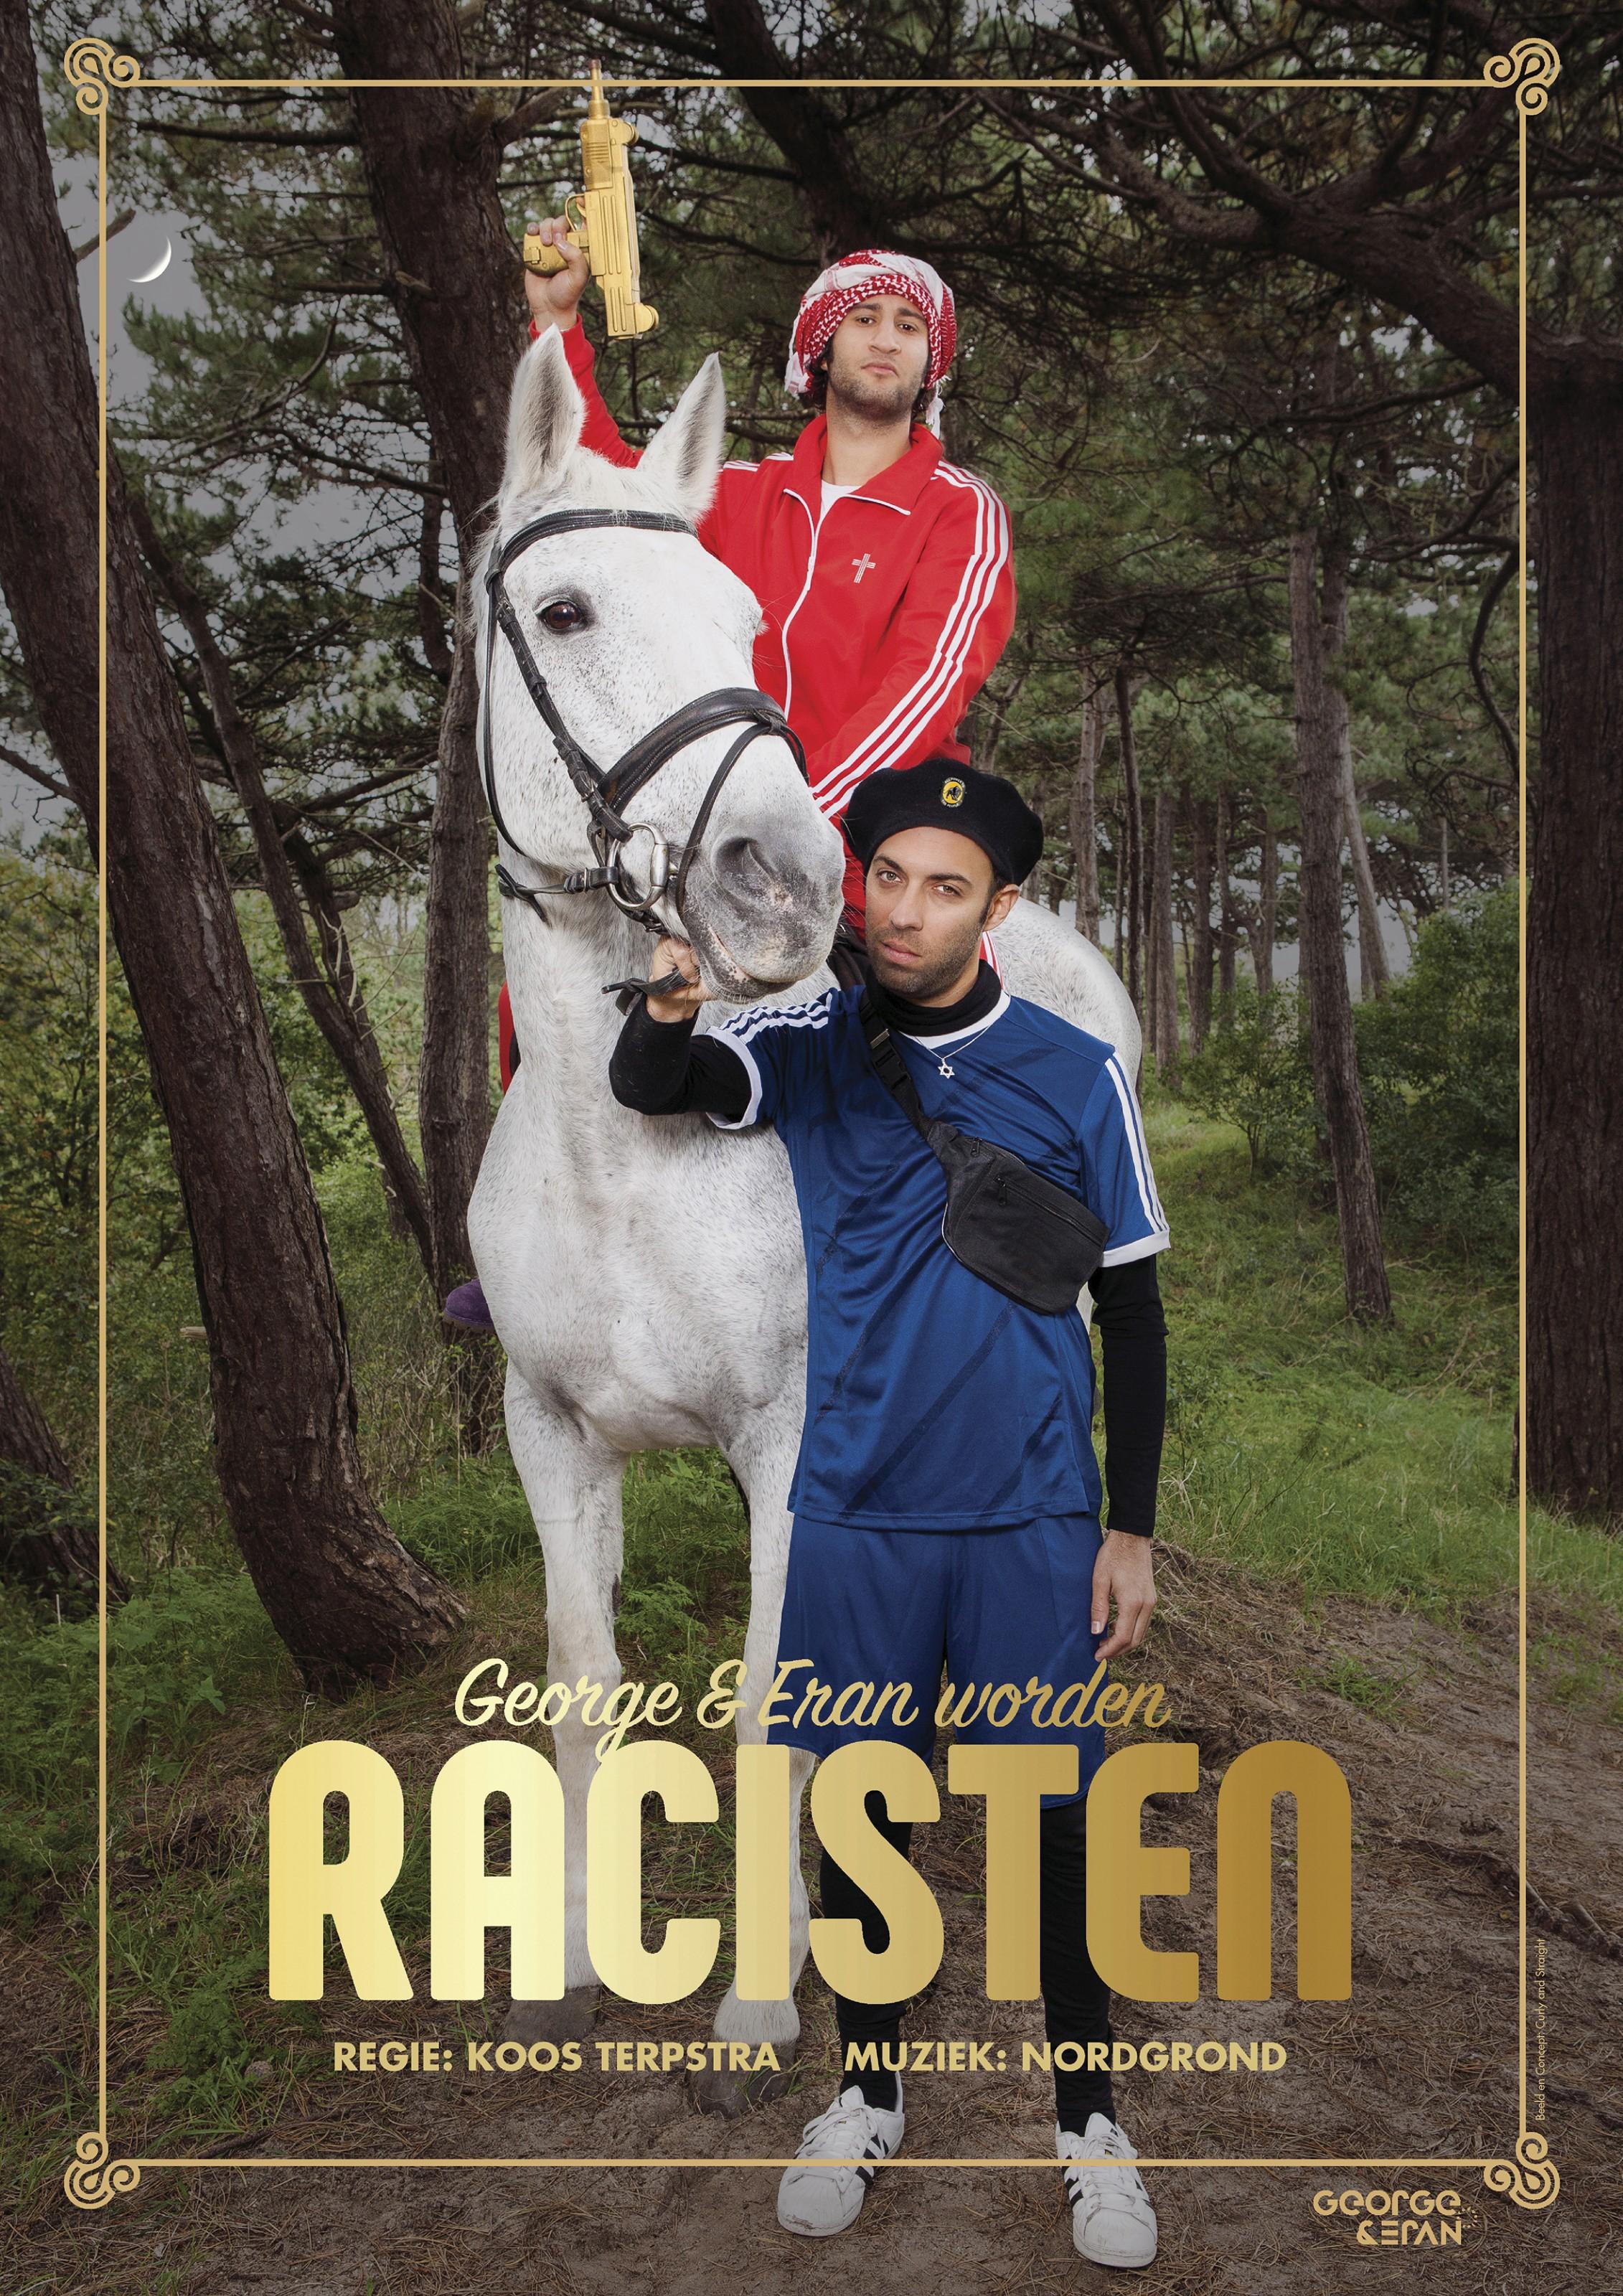 George-Eran-Racisten